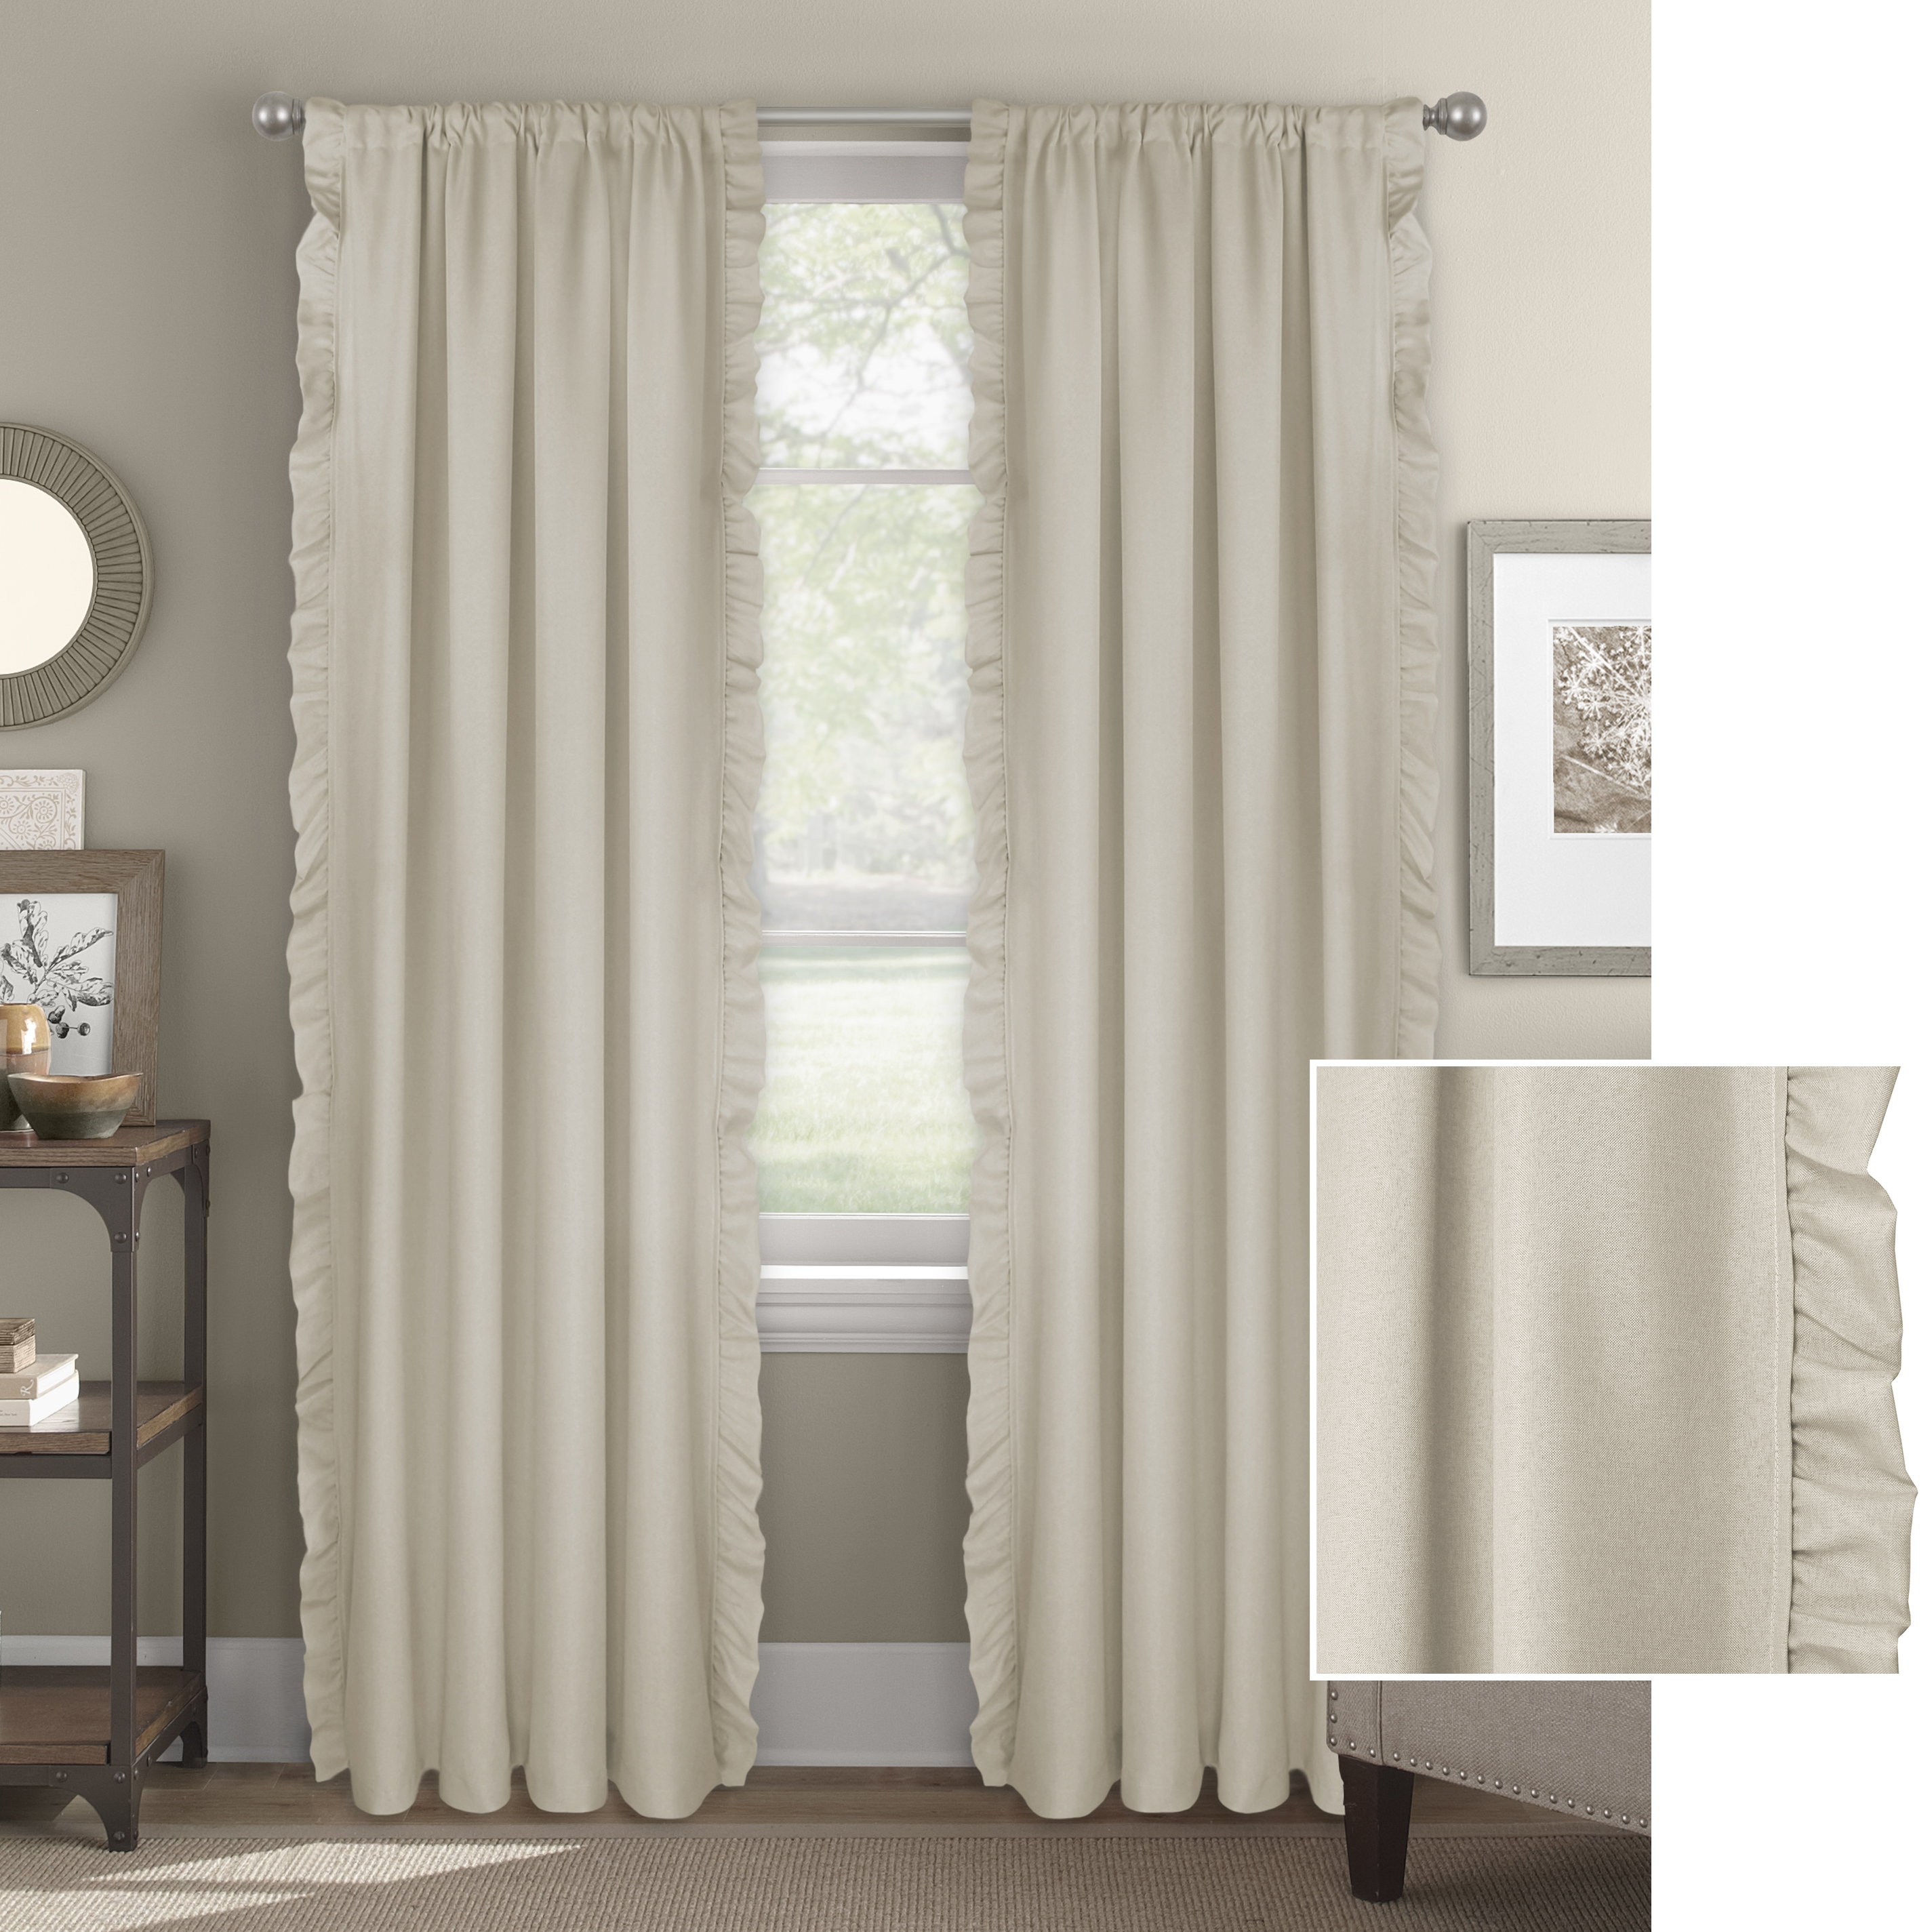 Better Homes & Gardens Vertical Ruffle Window Curtain Panel by Better Homes & Gardens